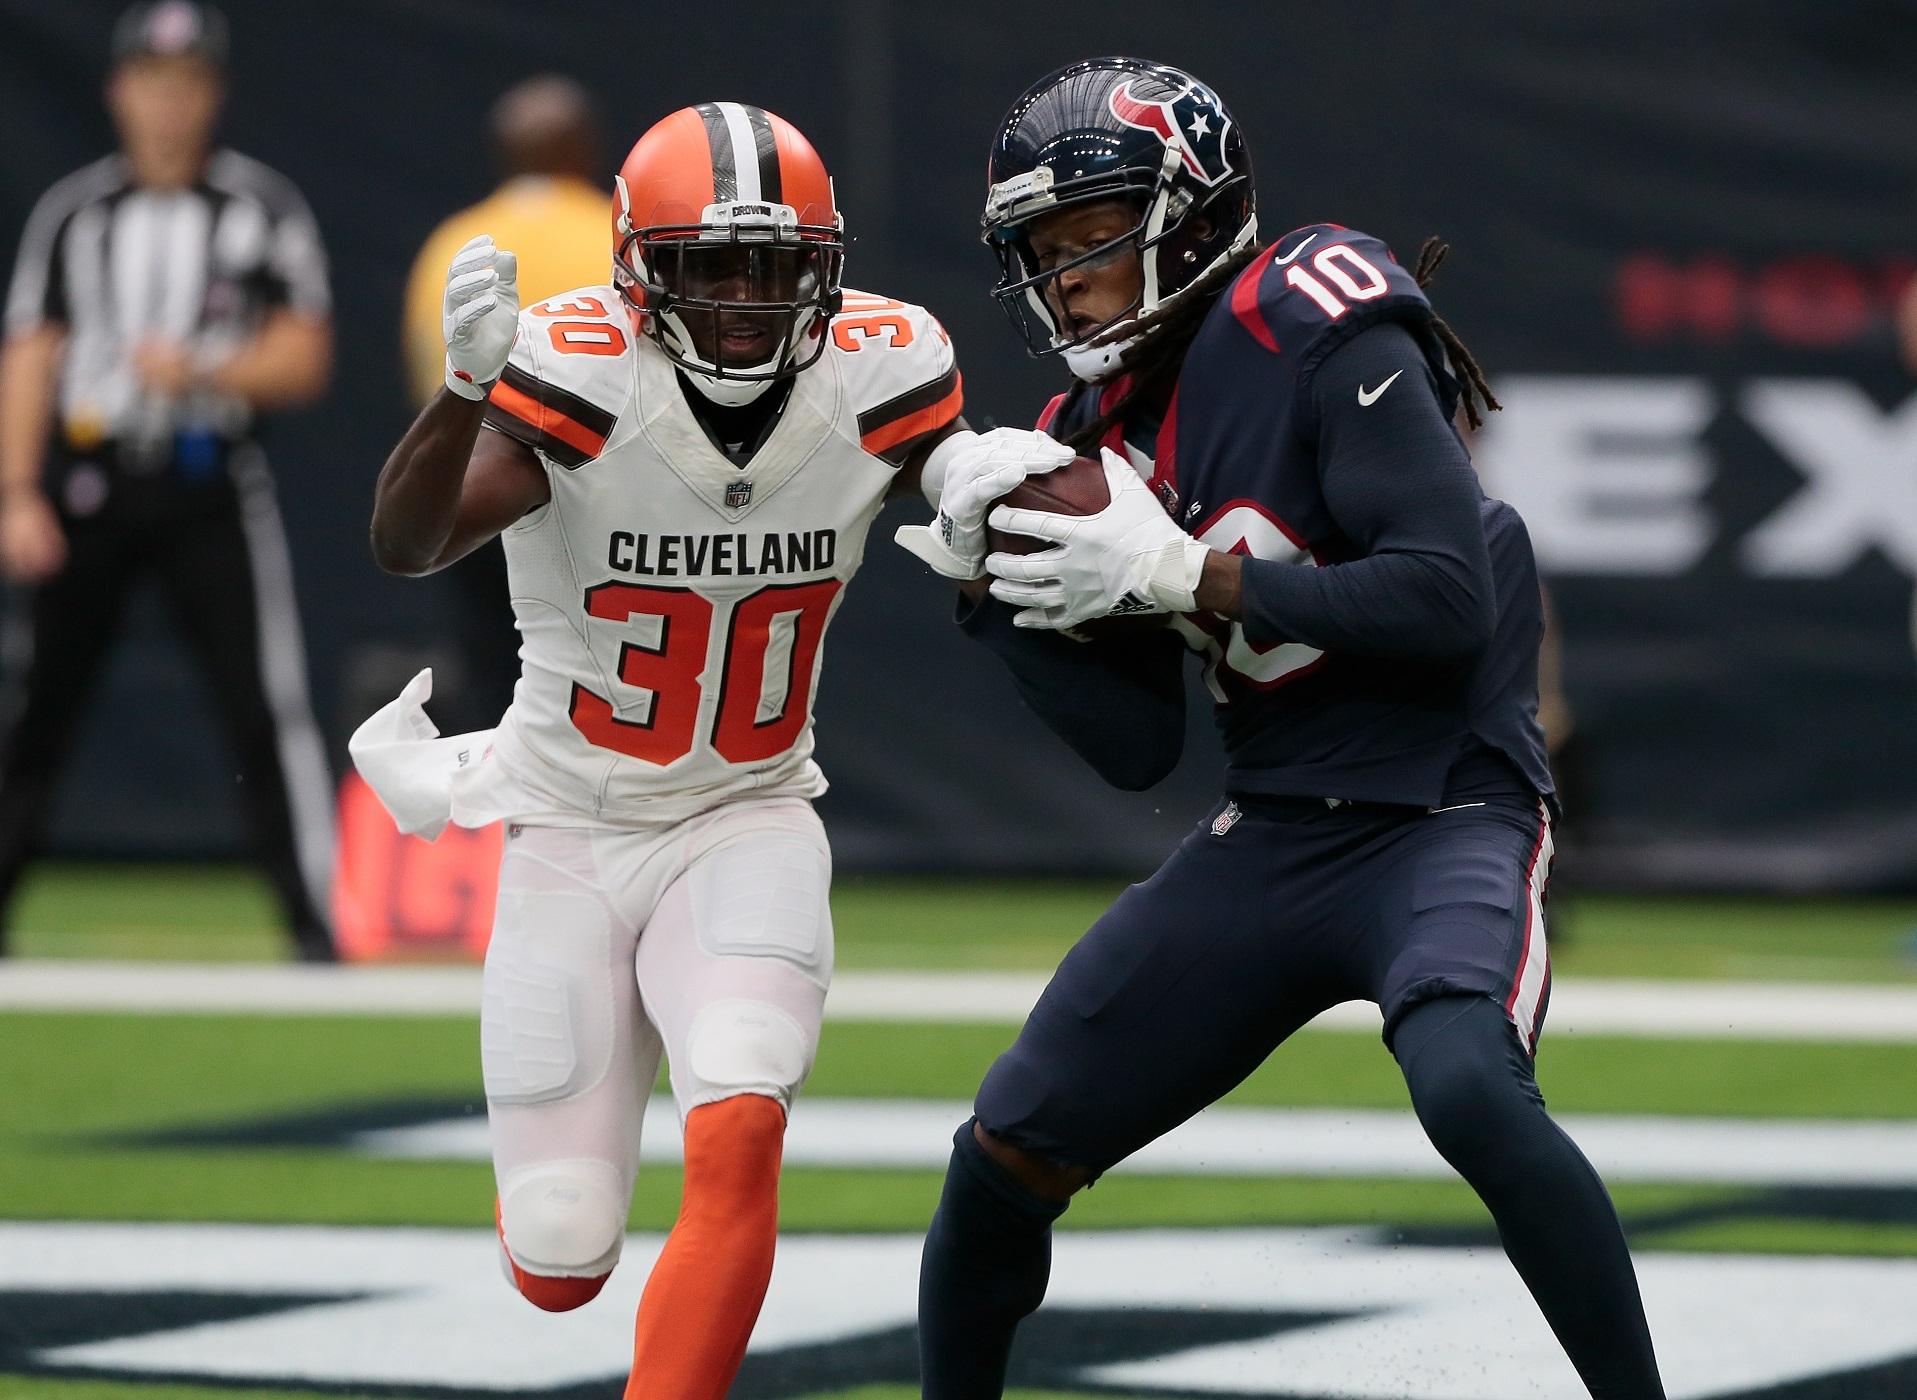 Kevin Zeitler Cleveland Browns RG NFL and PFF stats